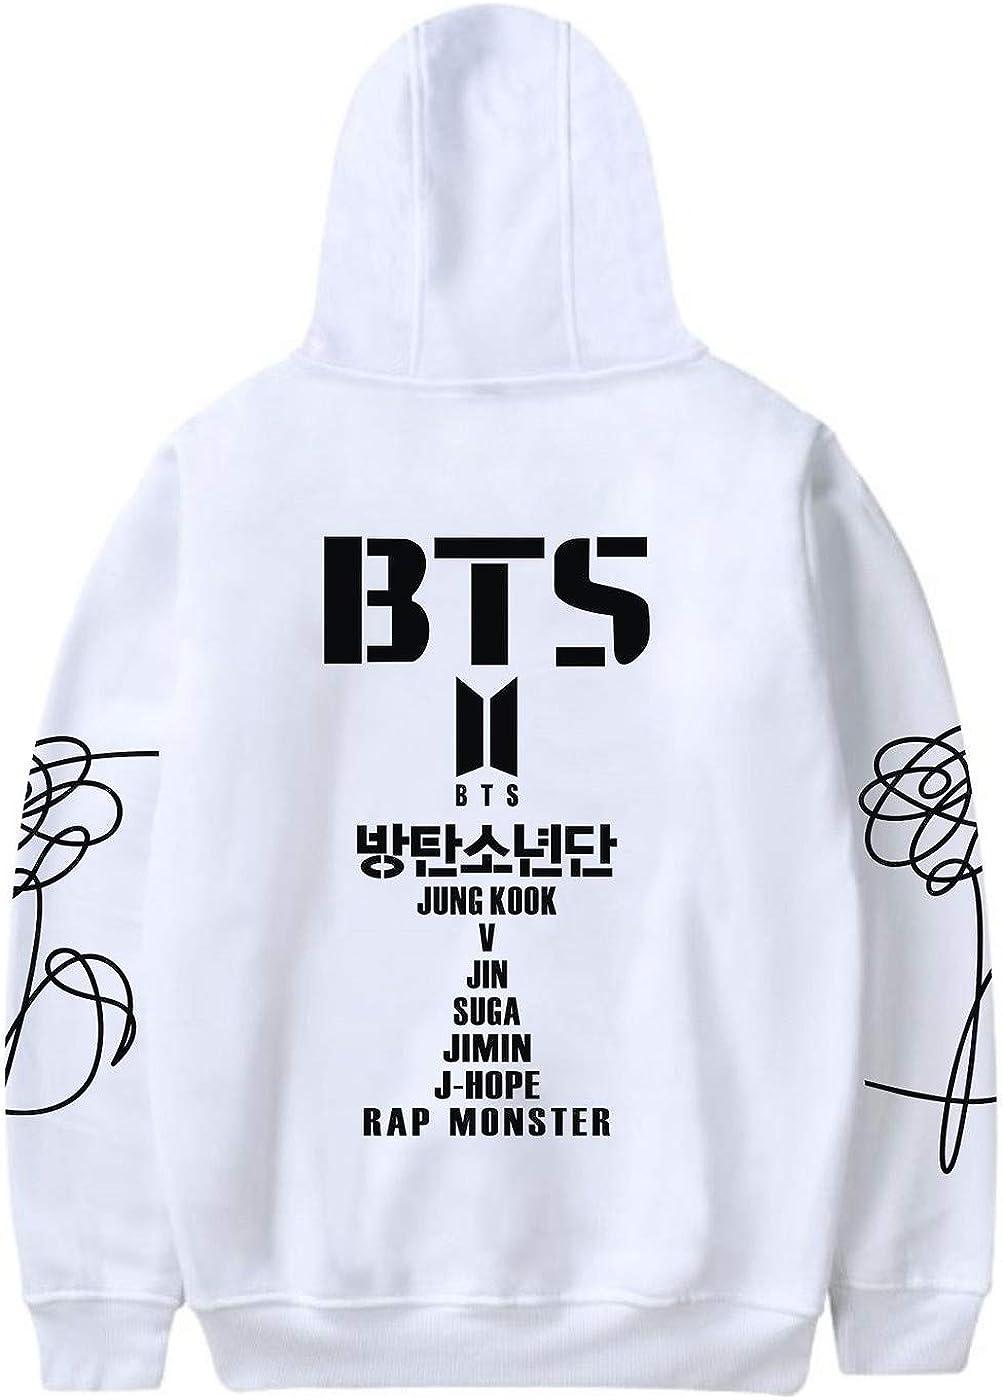 SIMYJOY Unisex BTS Fans Felpa con Cappuccio Bangtan Ragazzi Membri Logo Pullover Hip Pop Cool Felpa KPOP Street Fashion Top per A.R.M.Y Uomo Donna Teen